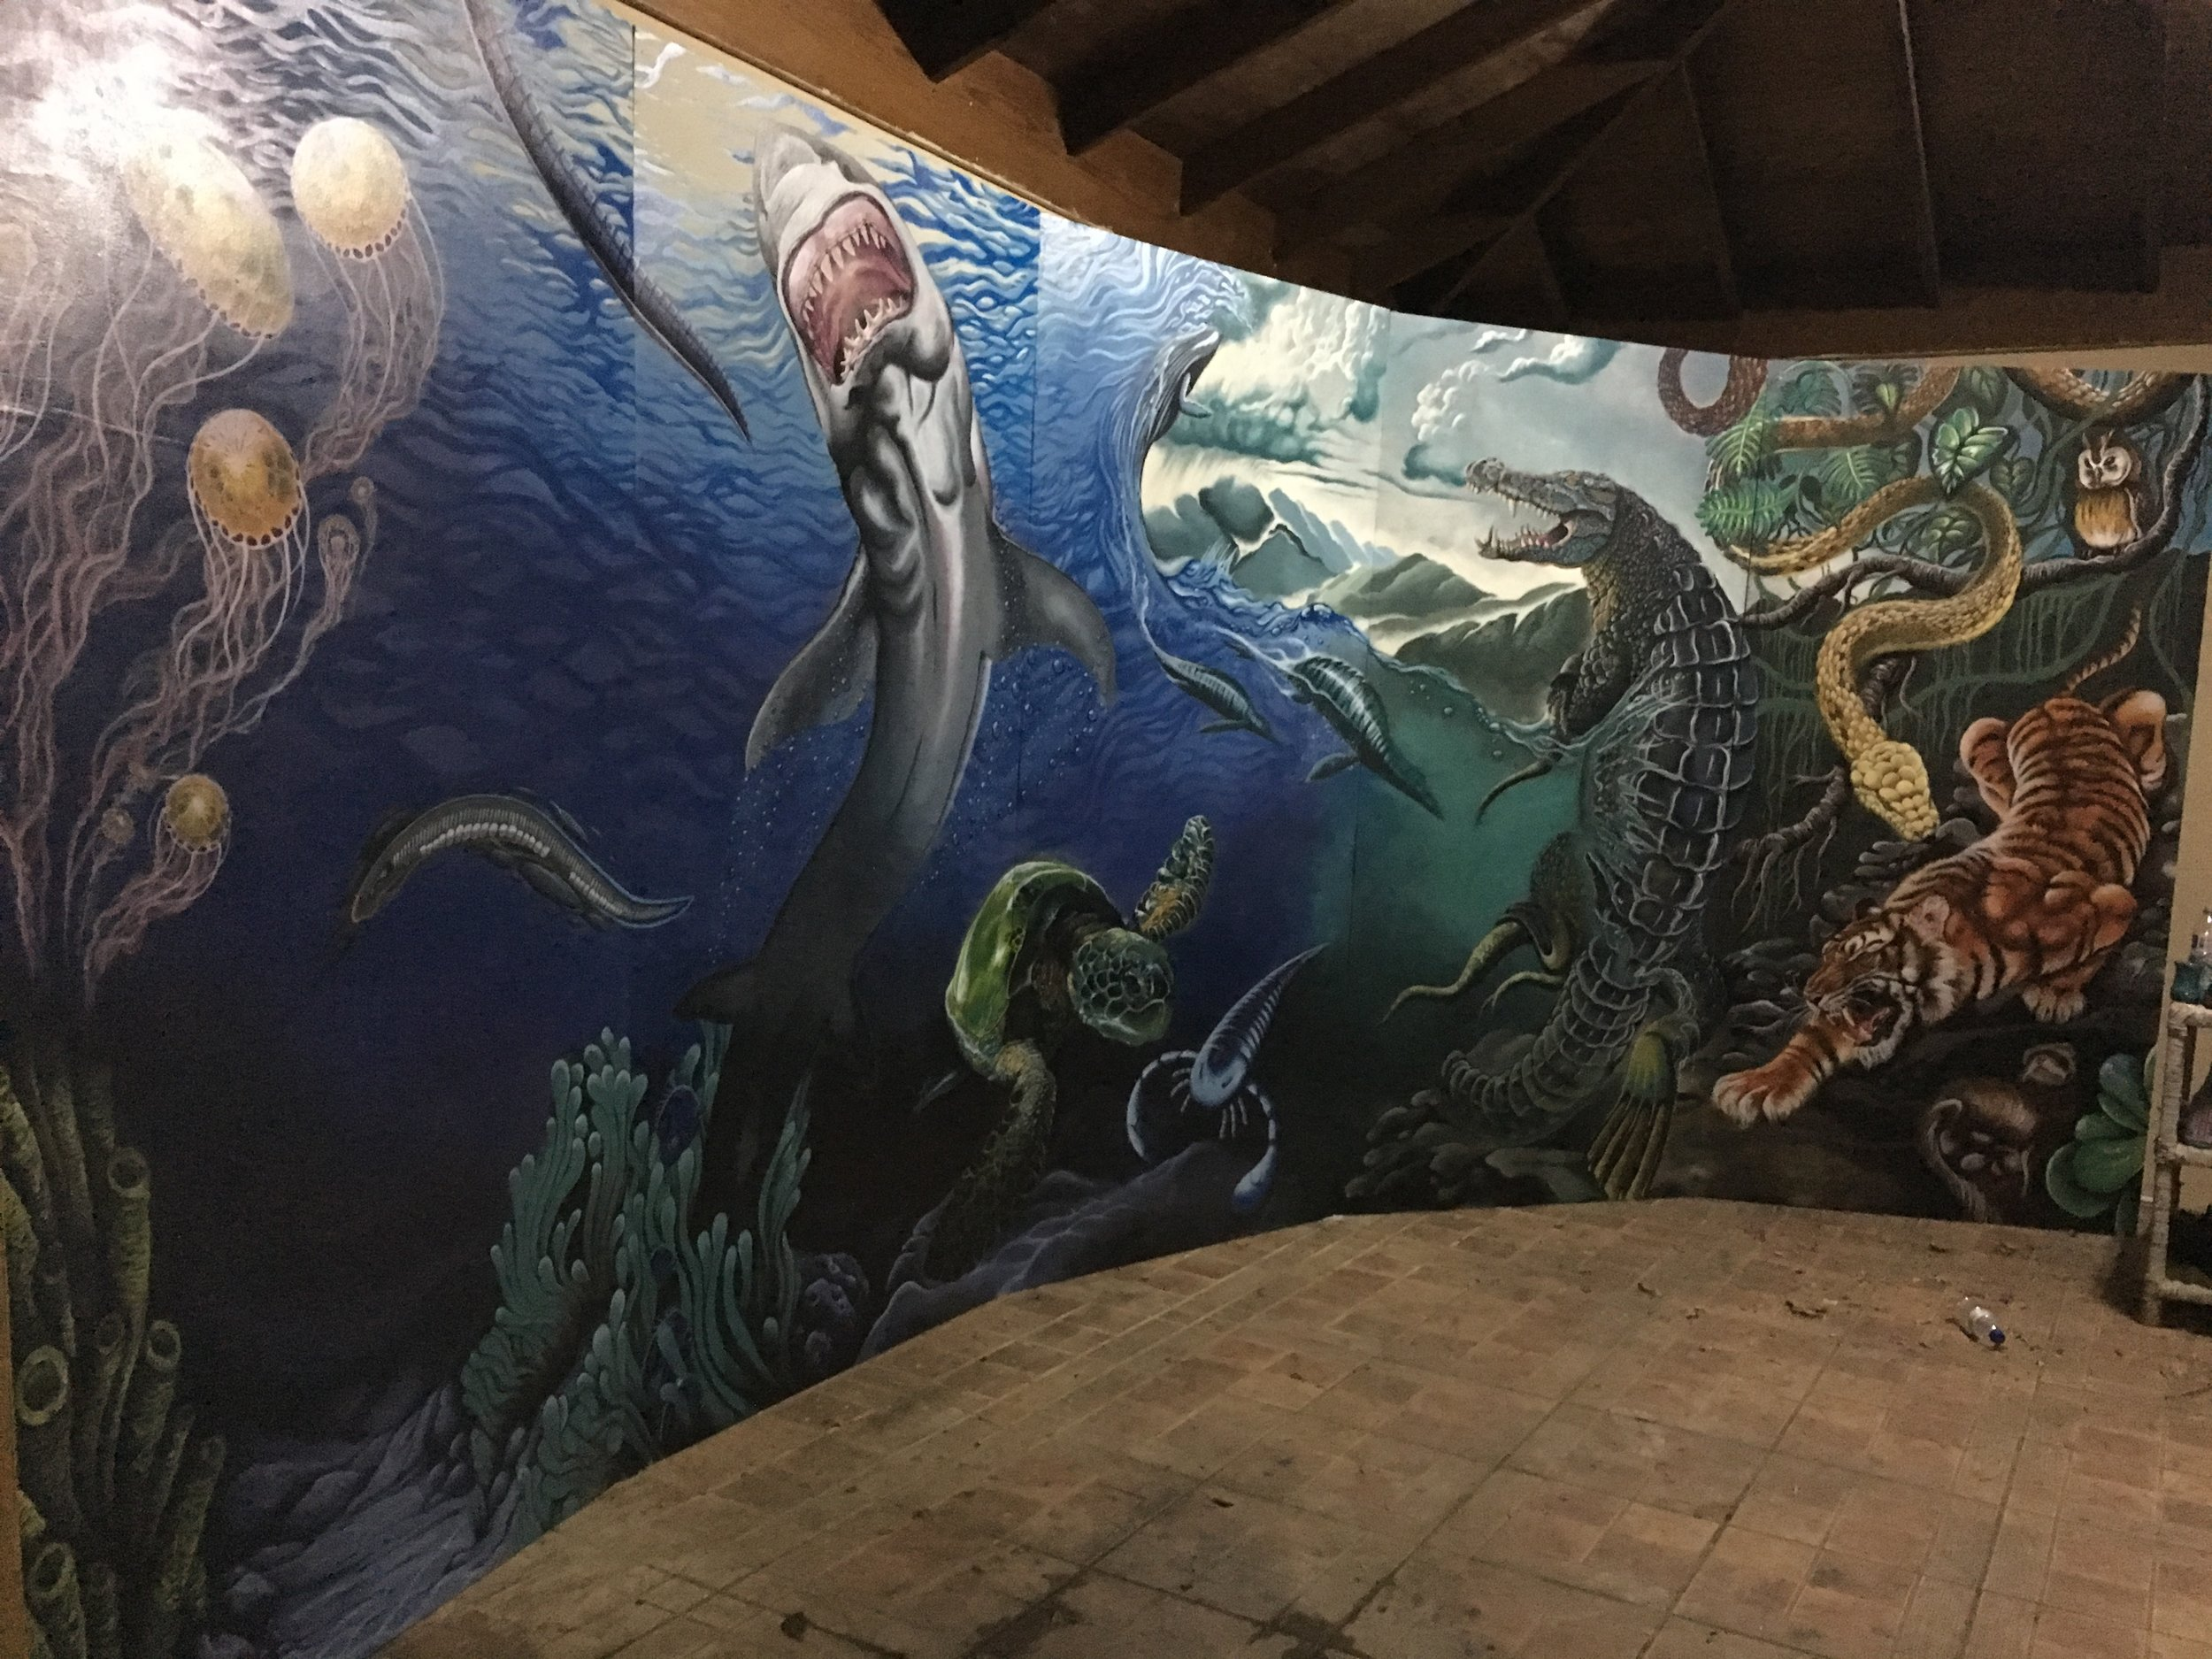 Leighton J. C. Estick.   Emergence to Breathe   (From Origin). 2018. Acrylic and Emulsion paints on Plywood panels. 8' x 8'.